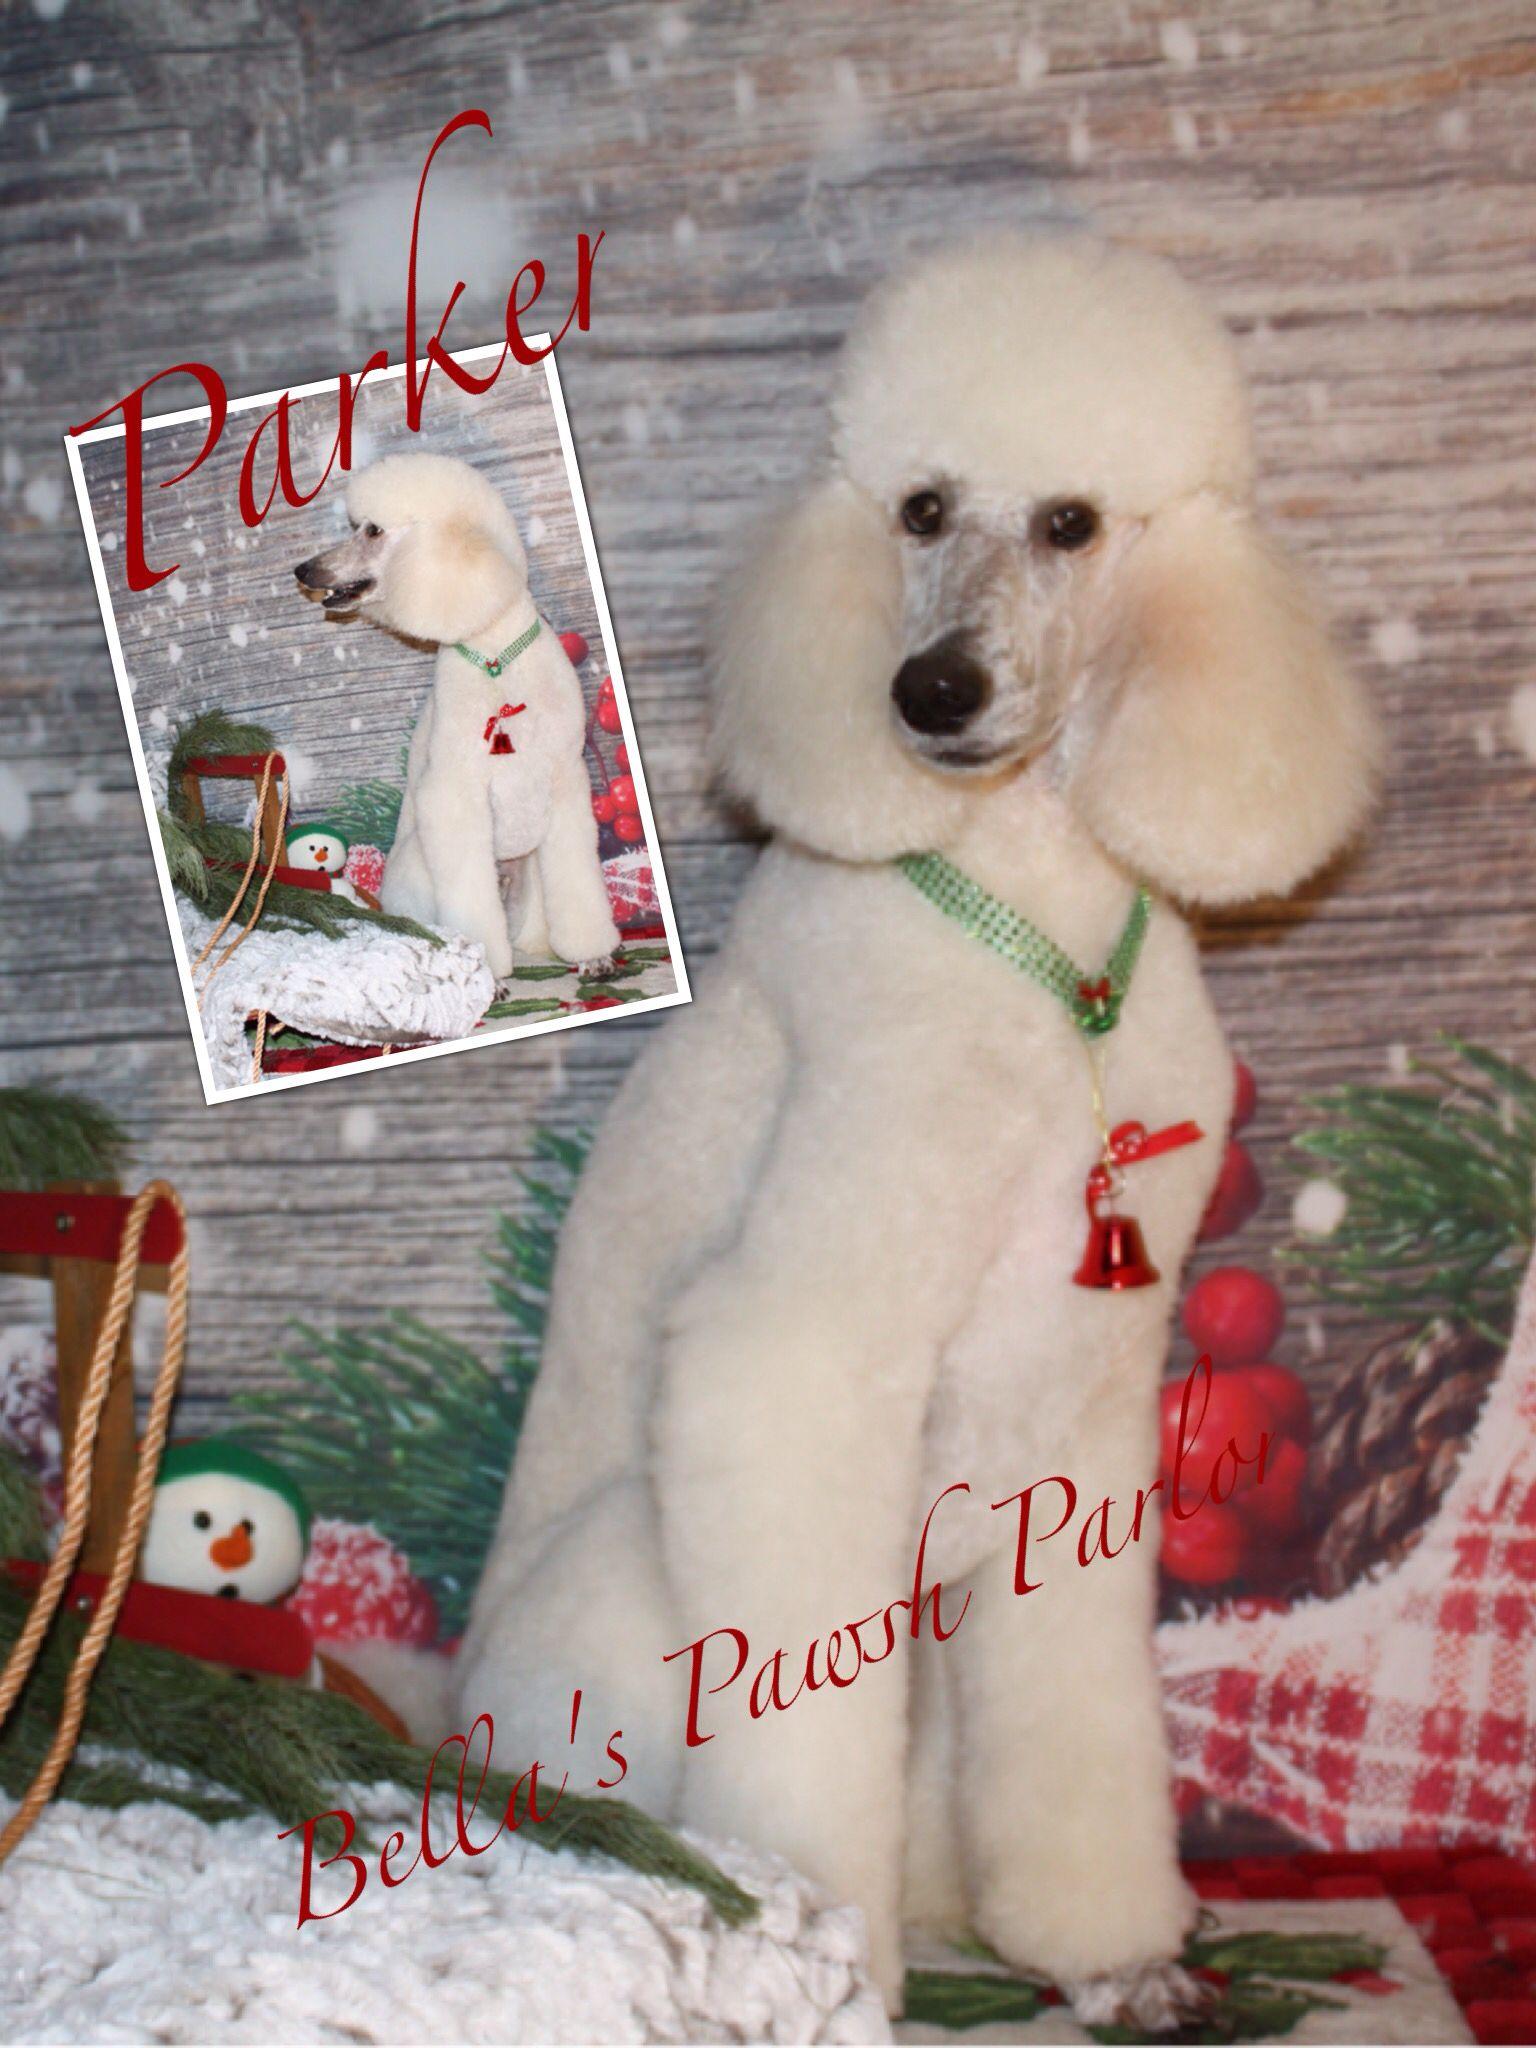 Bella S Pawsh Parlor Christmas Ornaments Holiday Decor Novelty Christmas